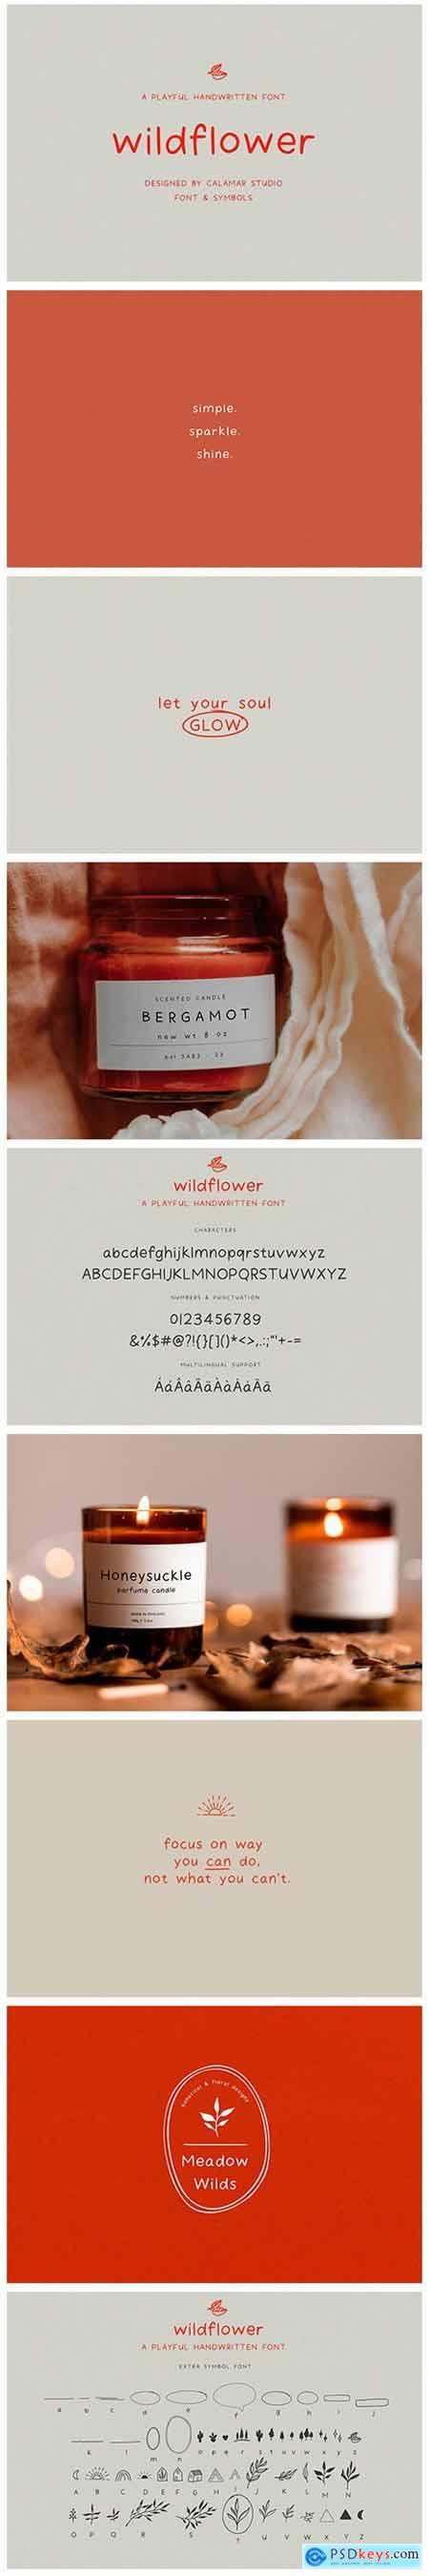 Wildflower - Handwritten Font 5332116